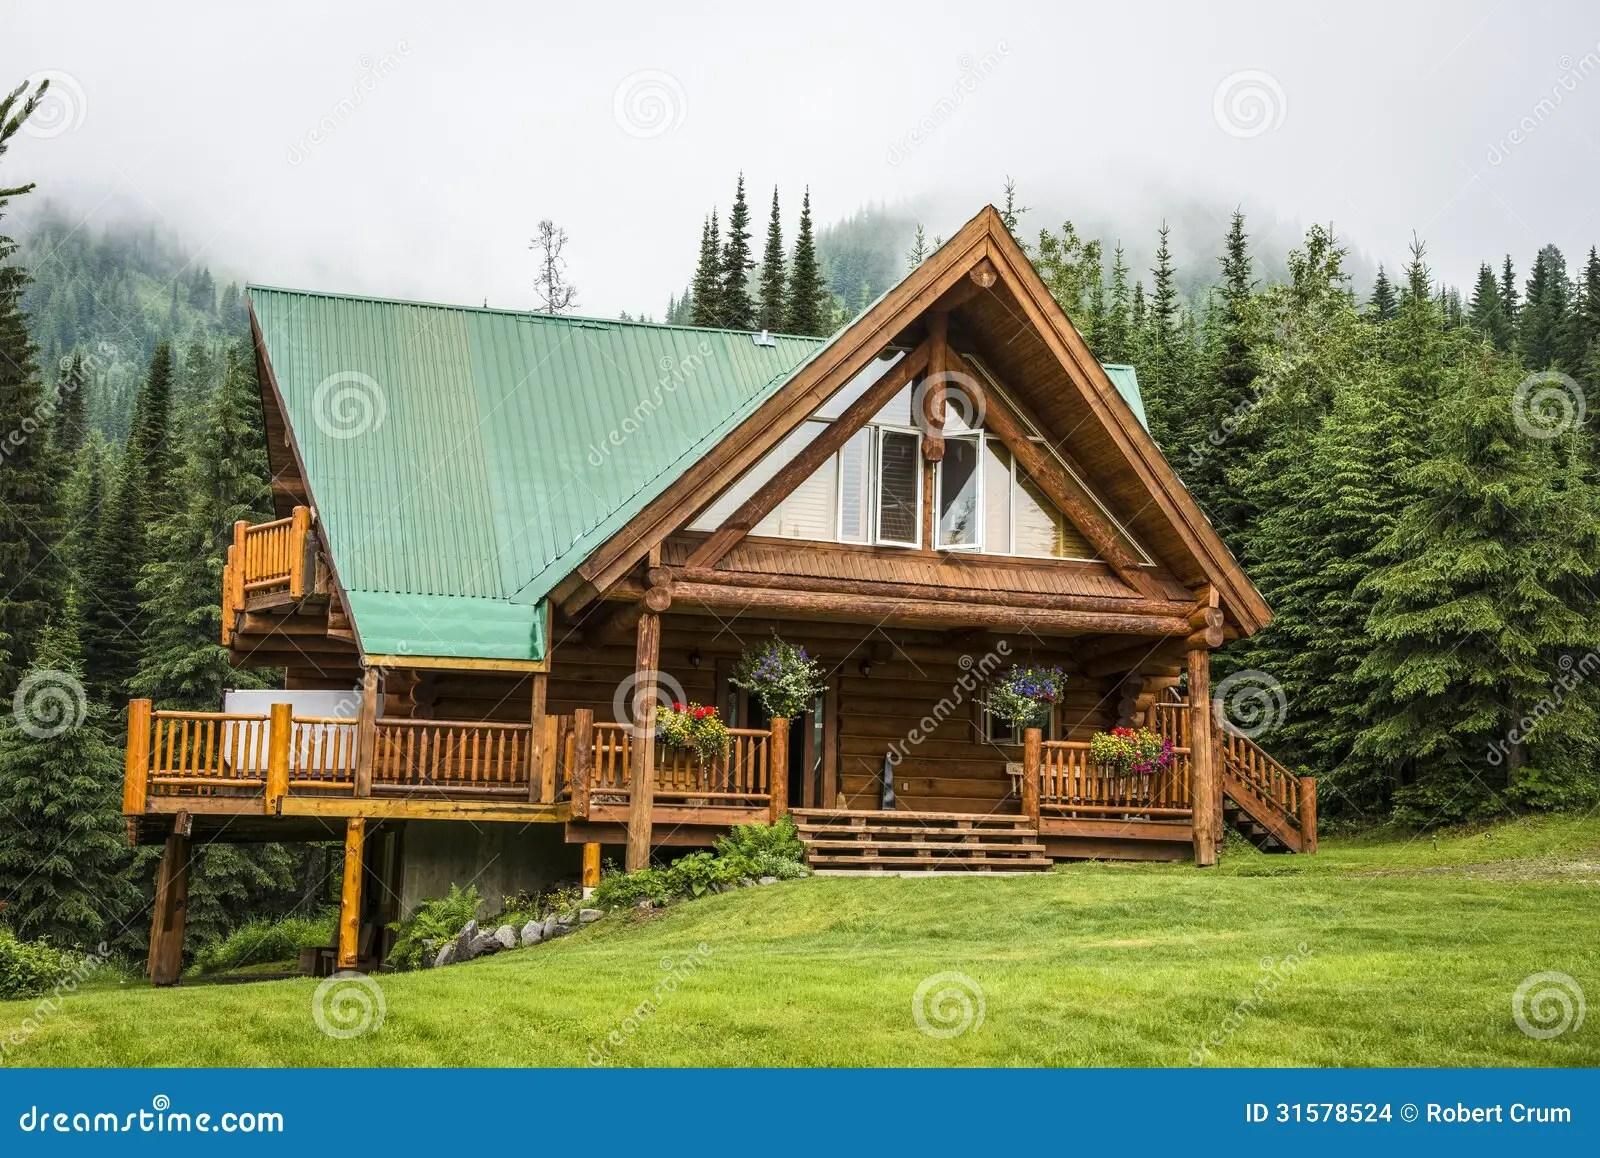 Contemporary Log Cabin Lodge Stock Photo  Image of resort